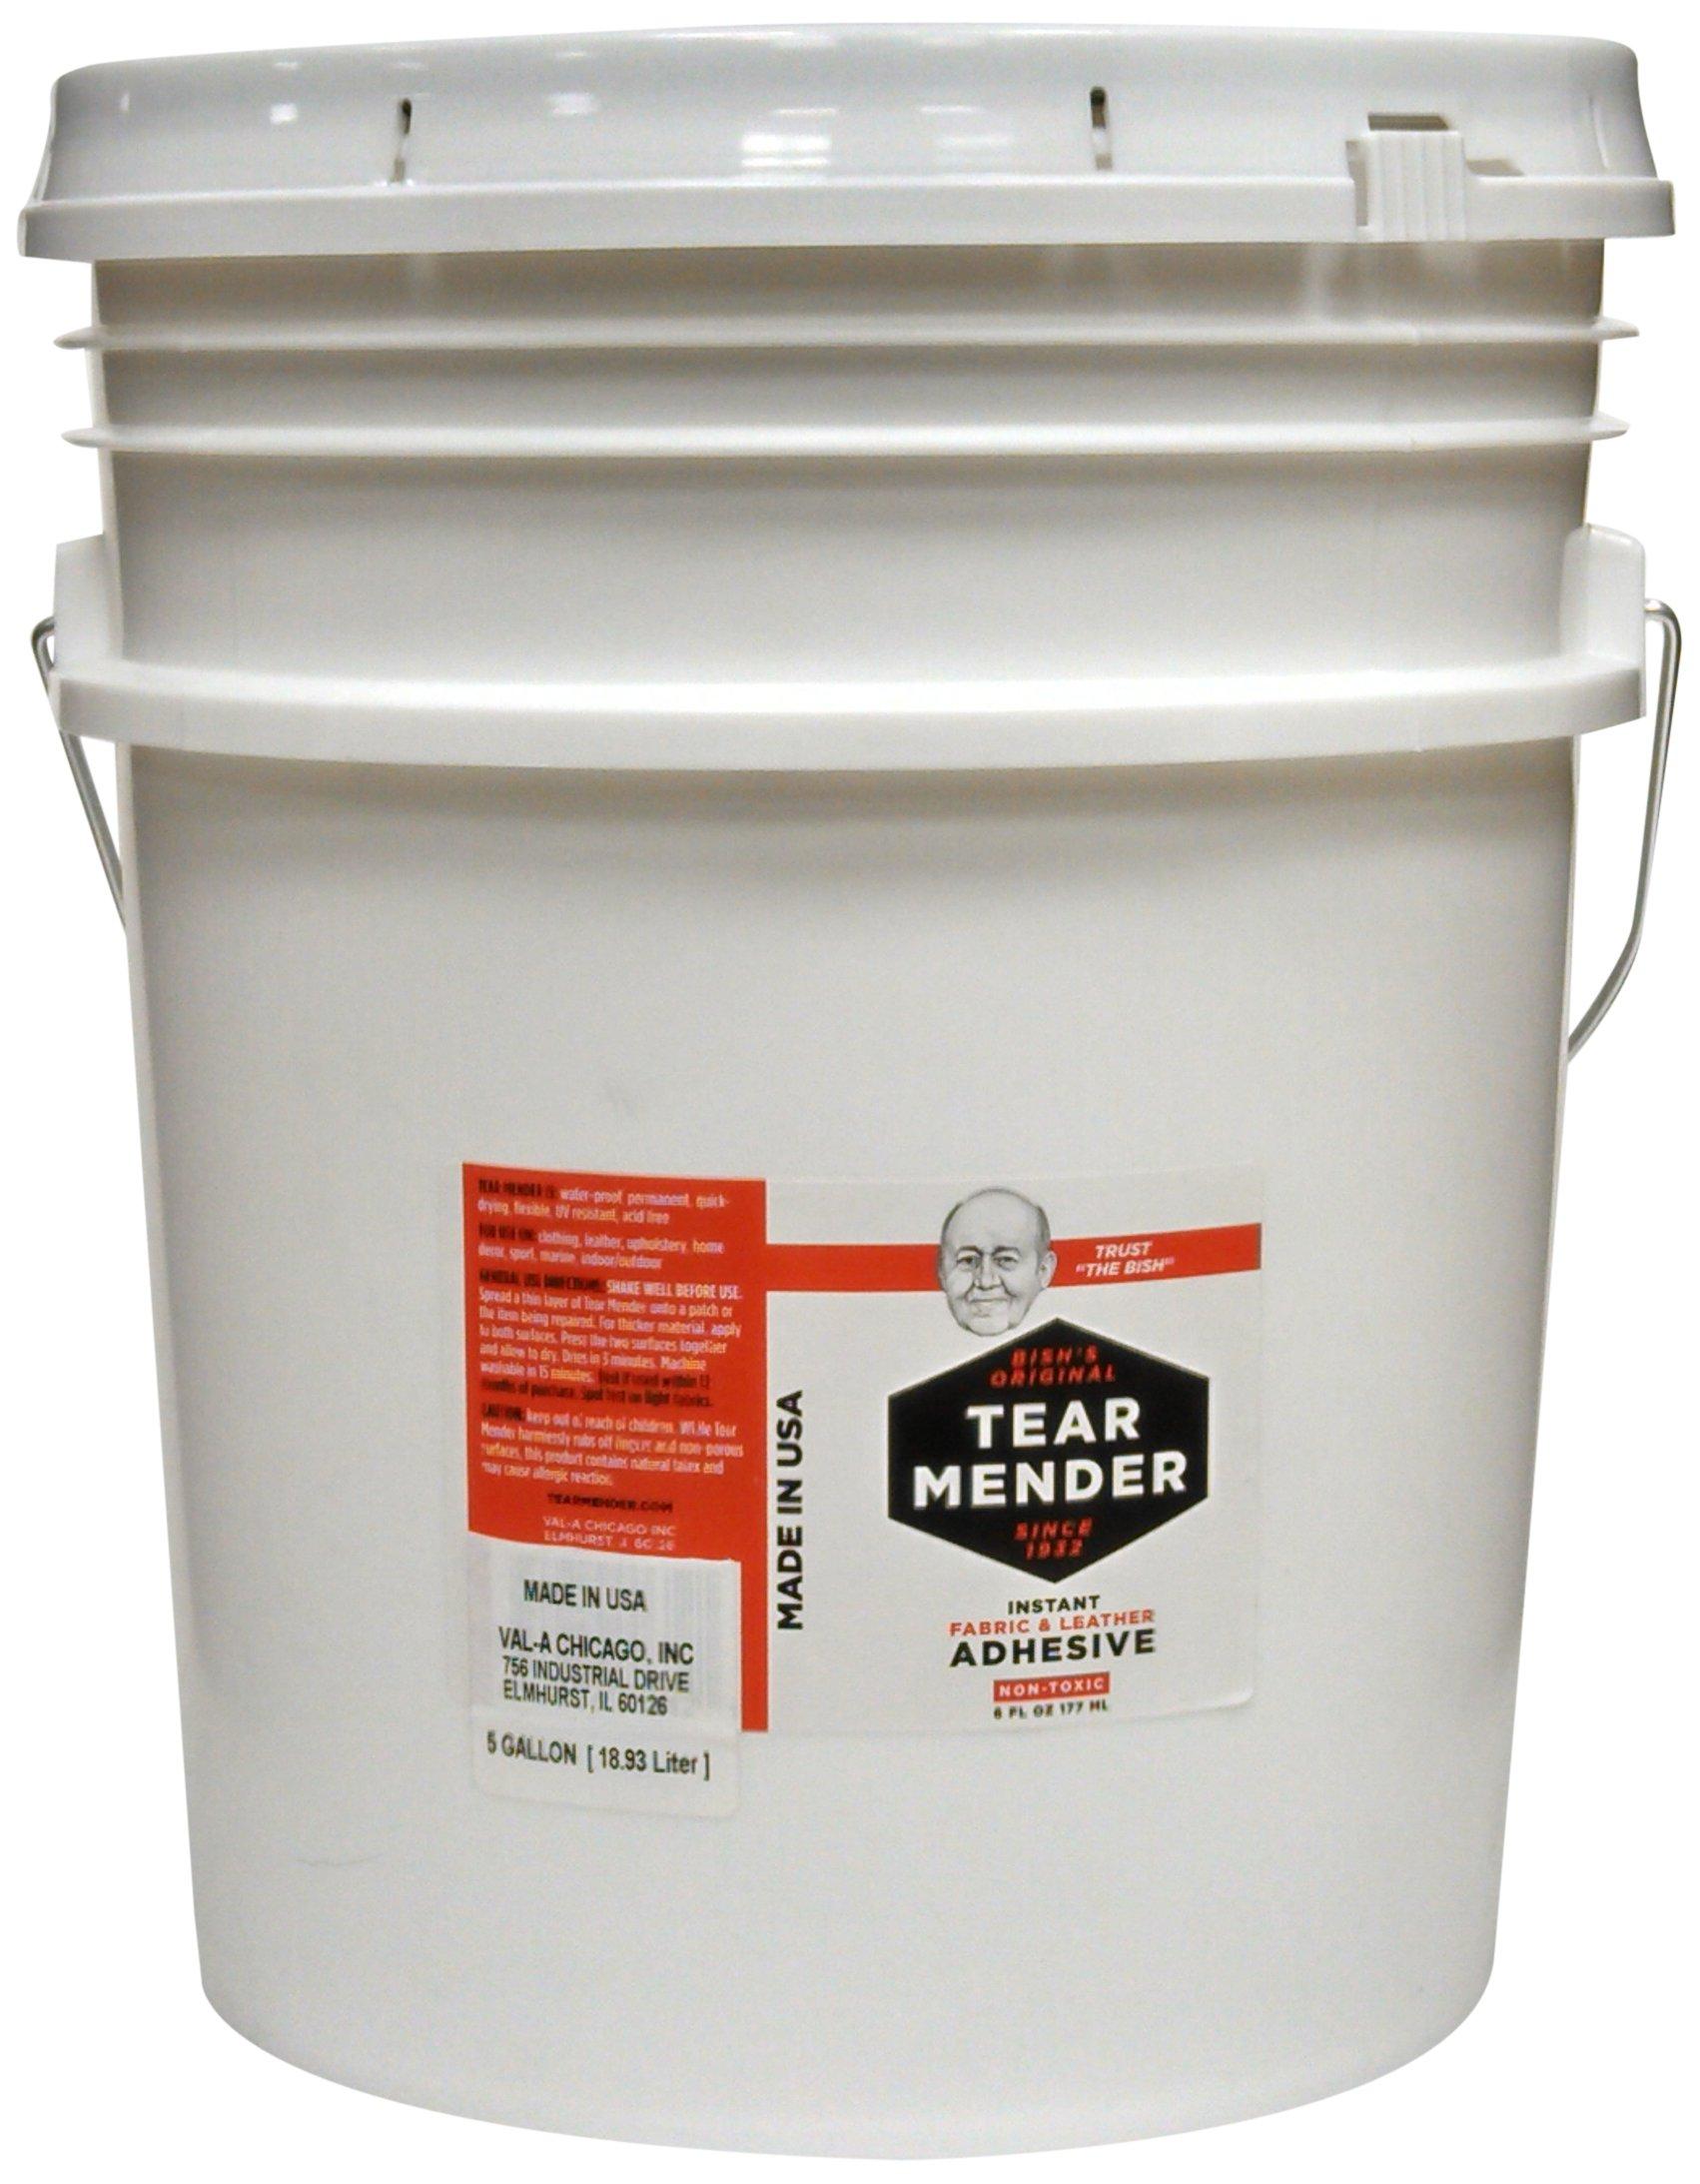 Tear Mender Bish's Original Tear Mender Instant Fabric and Leather Adhesive